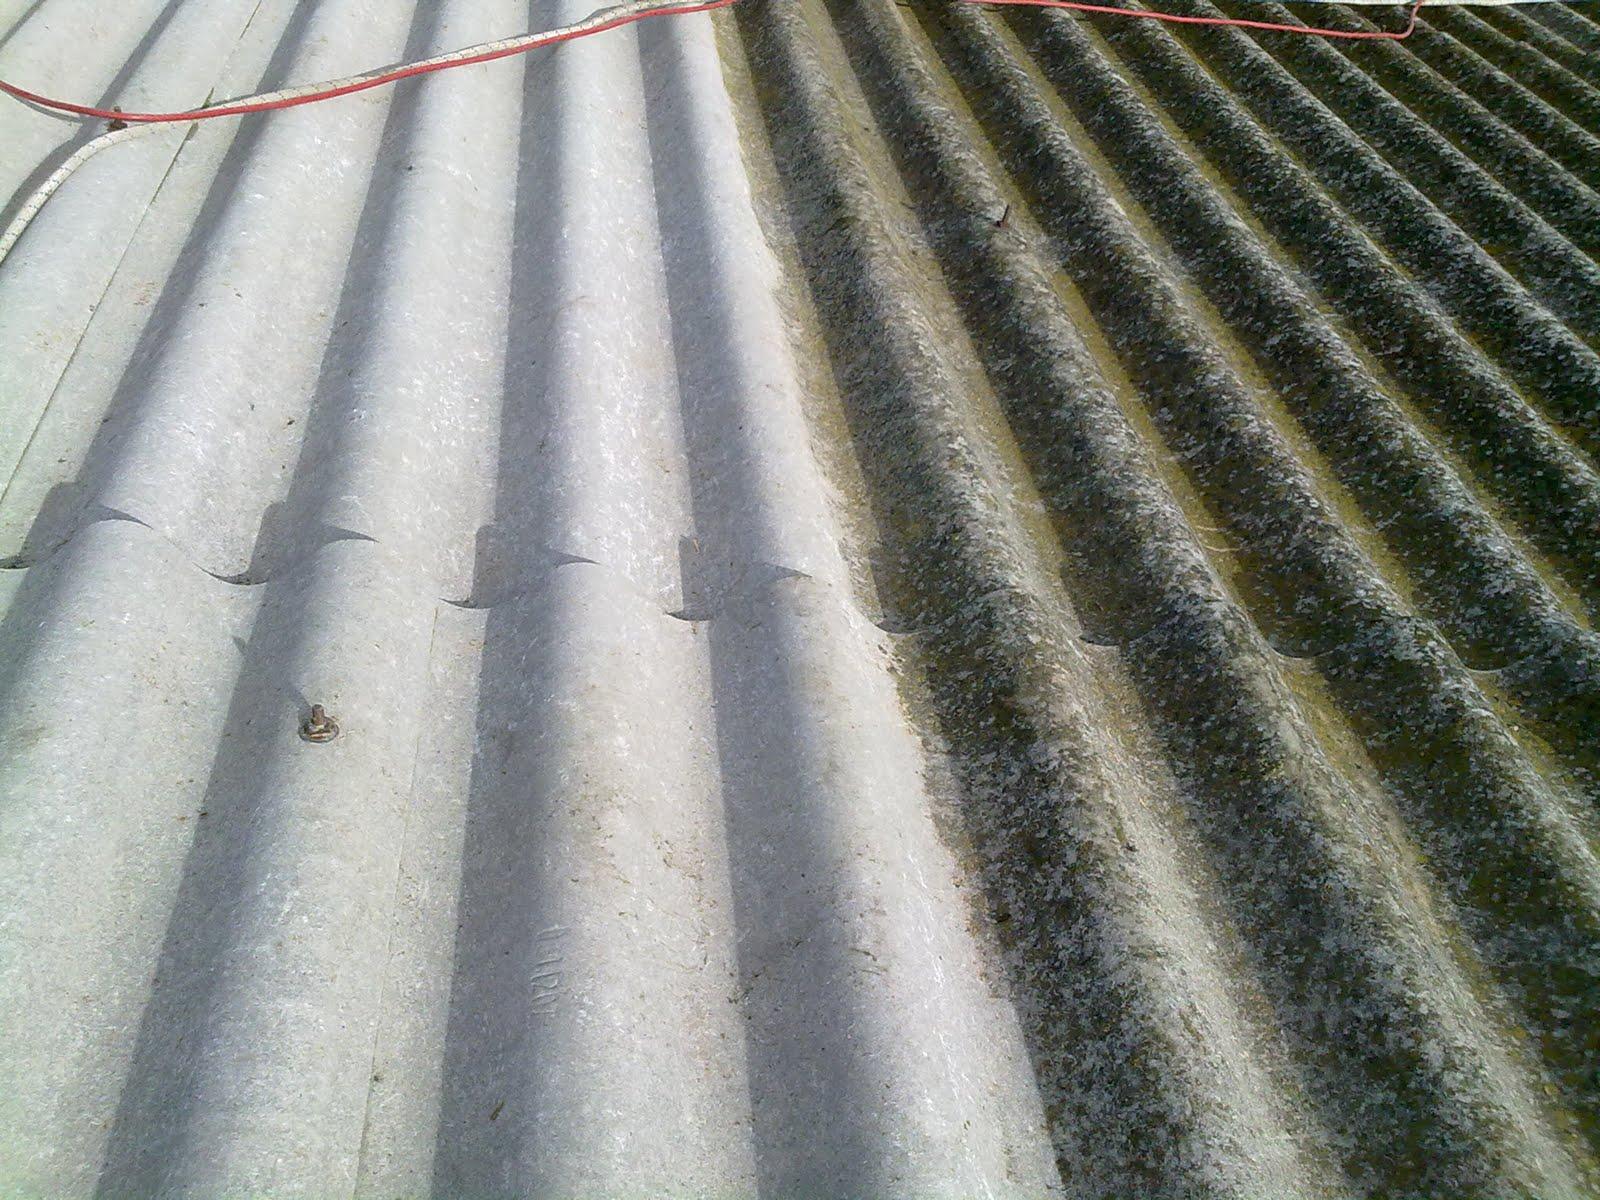 Reparar uralita reparar techo de uralita limpiar placas - Placas de fibrocemento precios ...